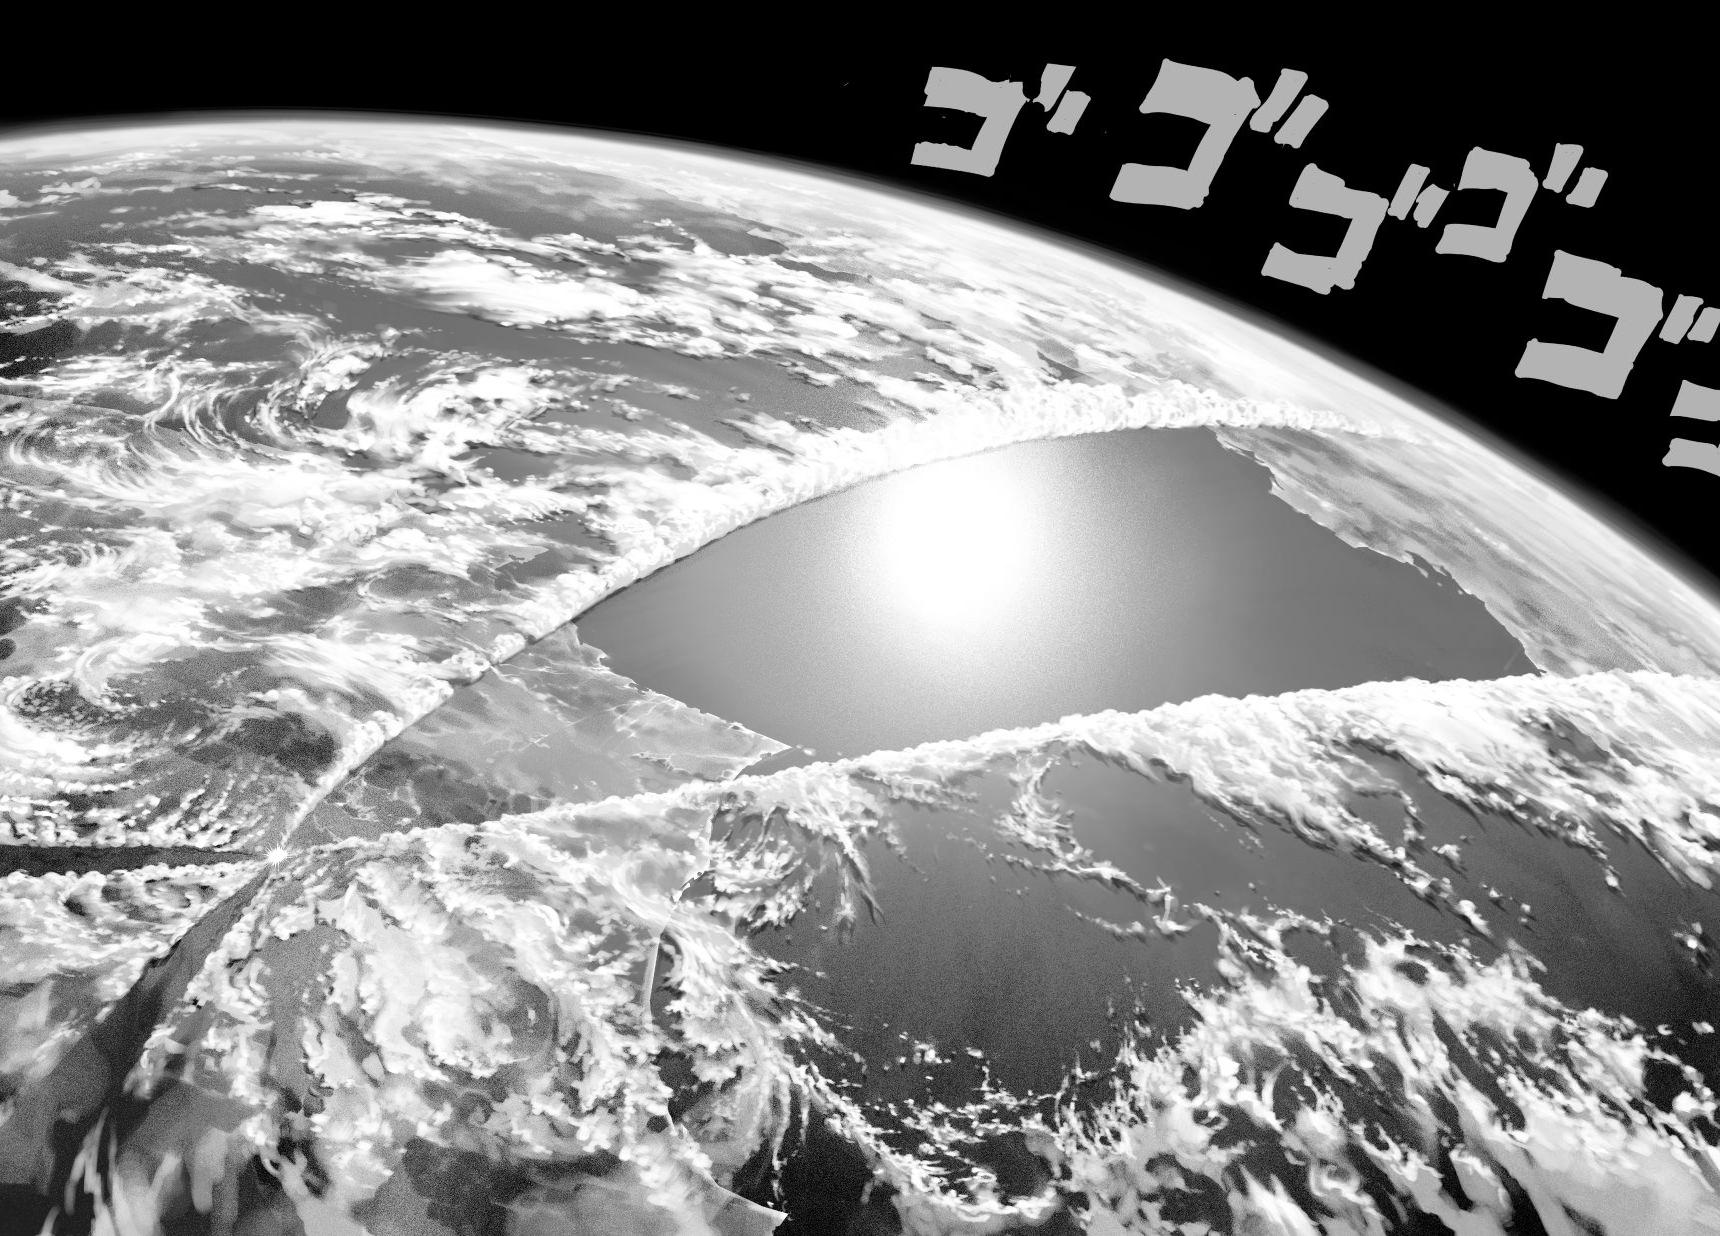 Black And White Atmosphere Monochrome Photography Earth Of Planet Phenomenon